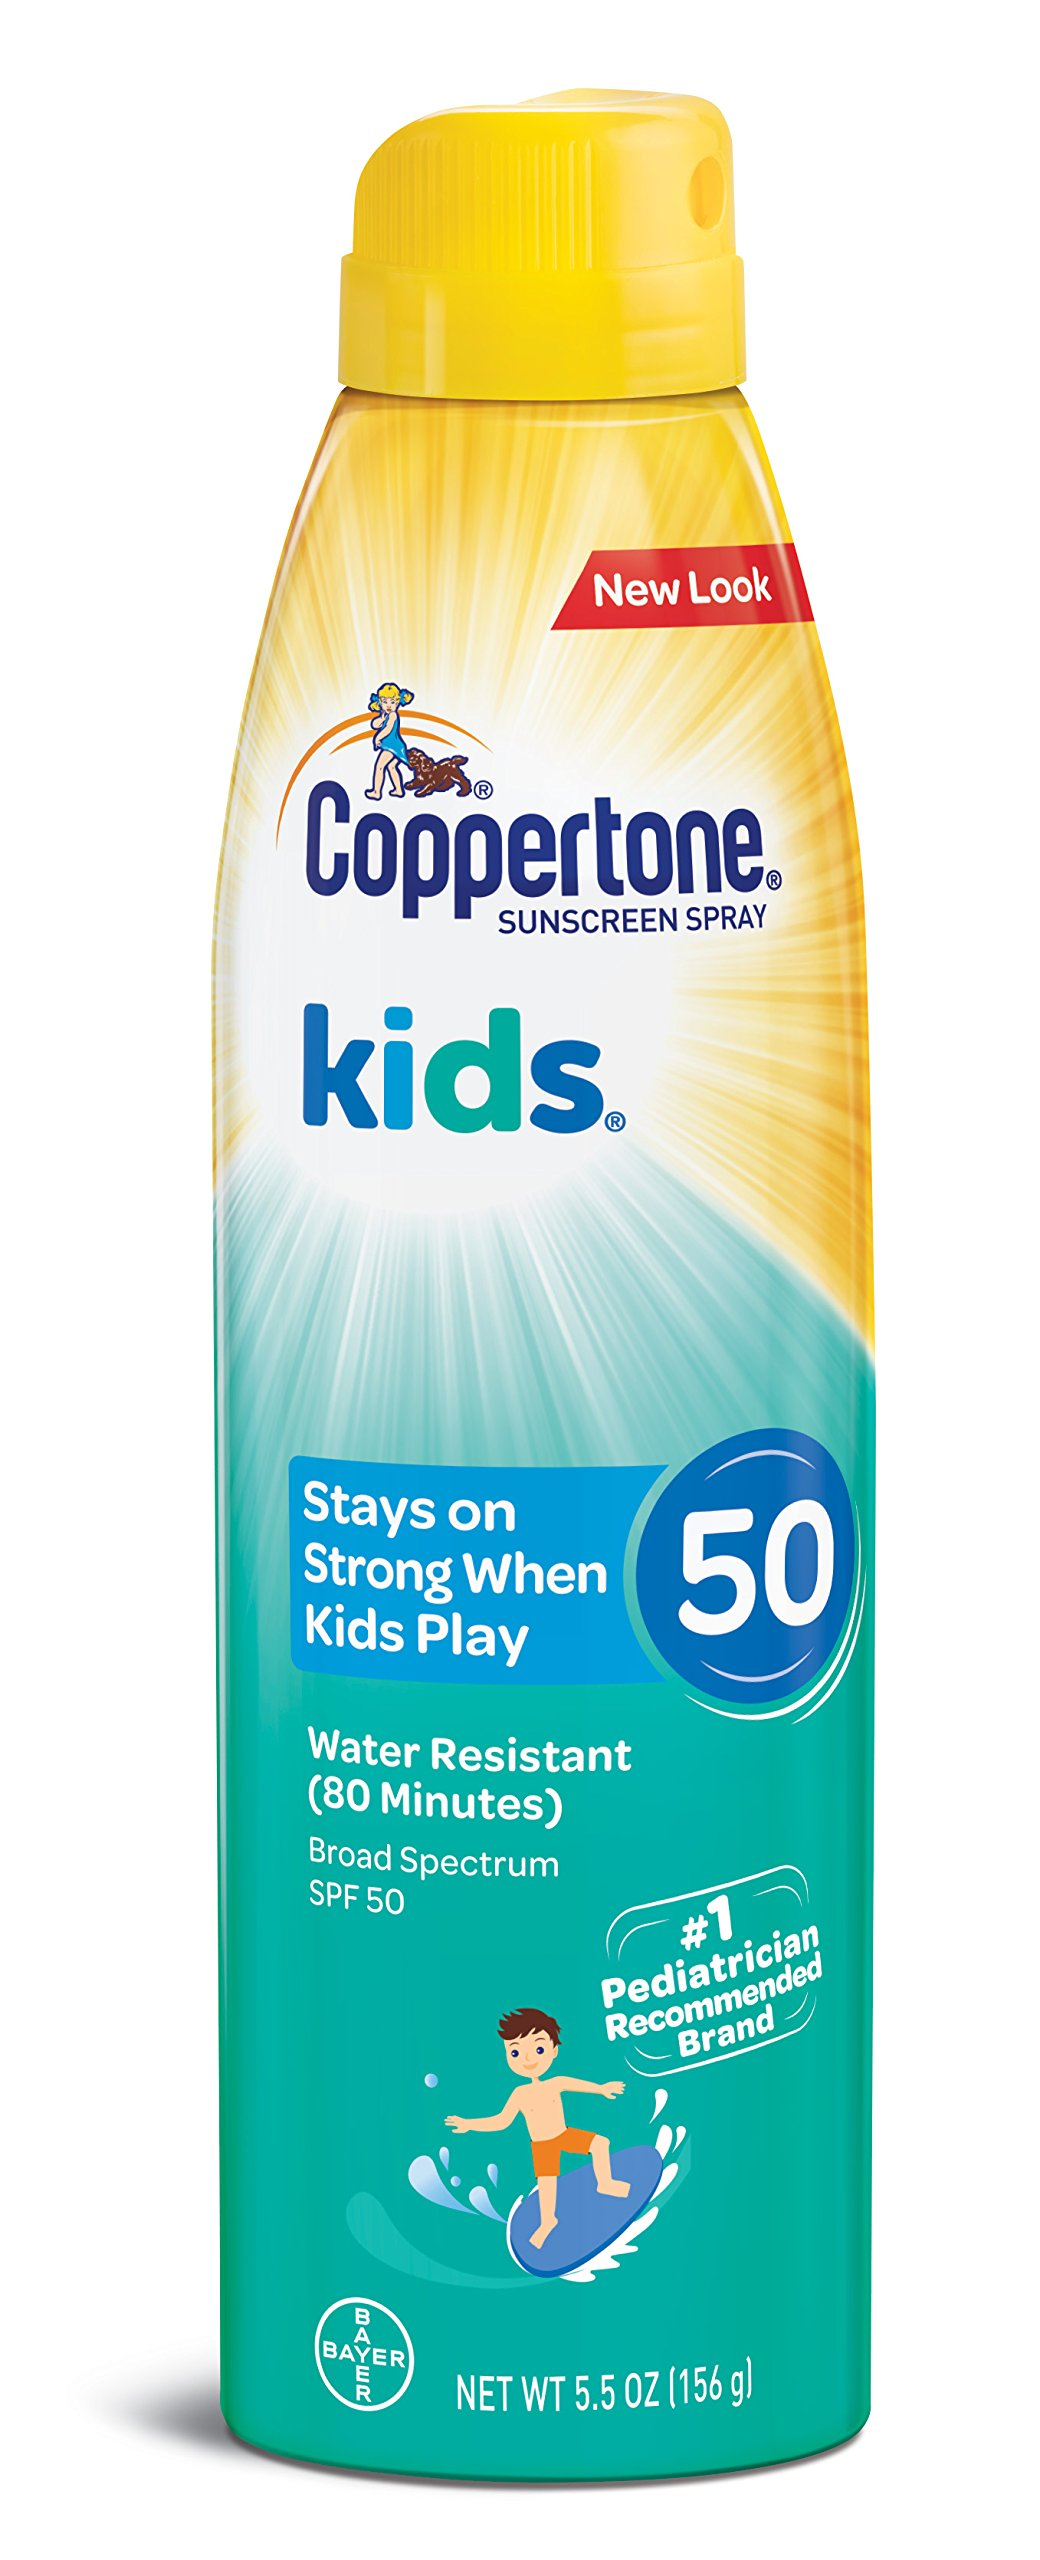 Coppertone KIDS Sunscreen Continuous Spray SPF 50 (5.5-Ounce)